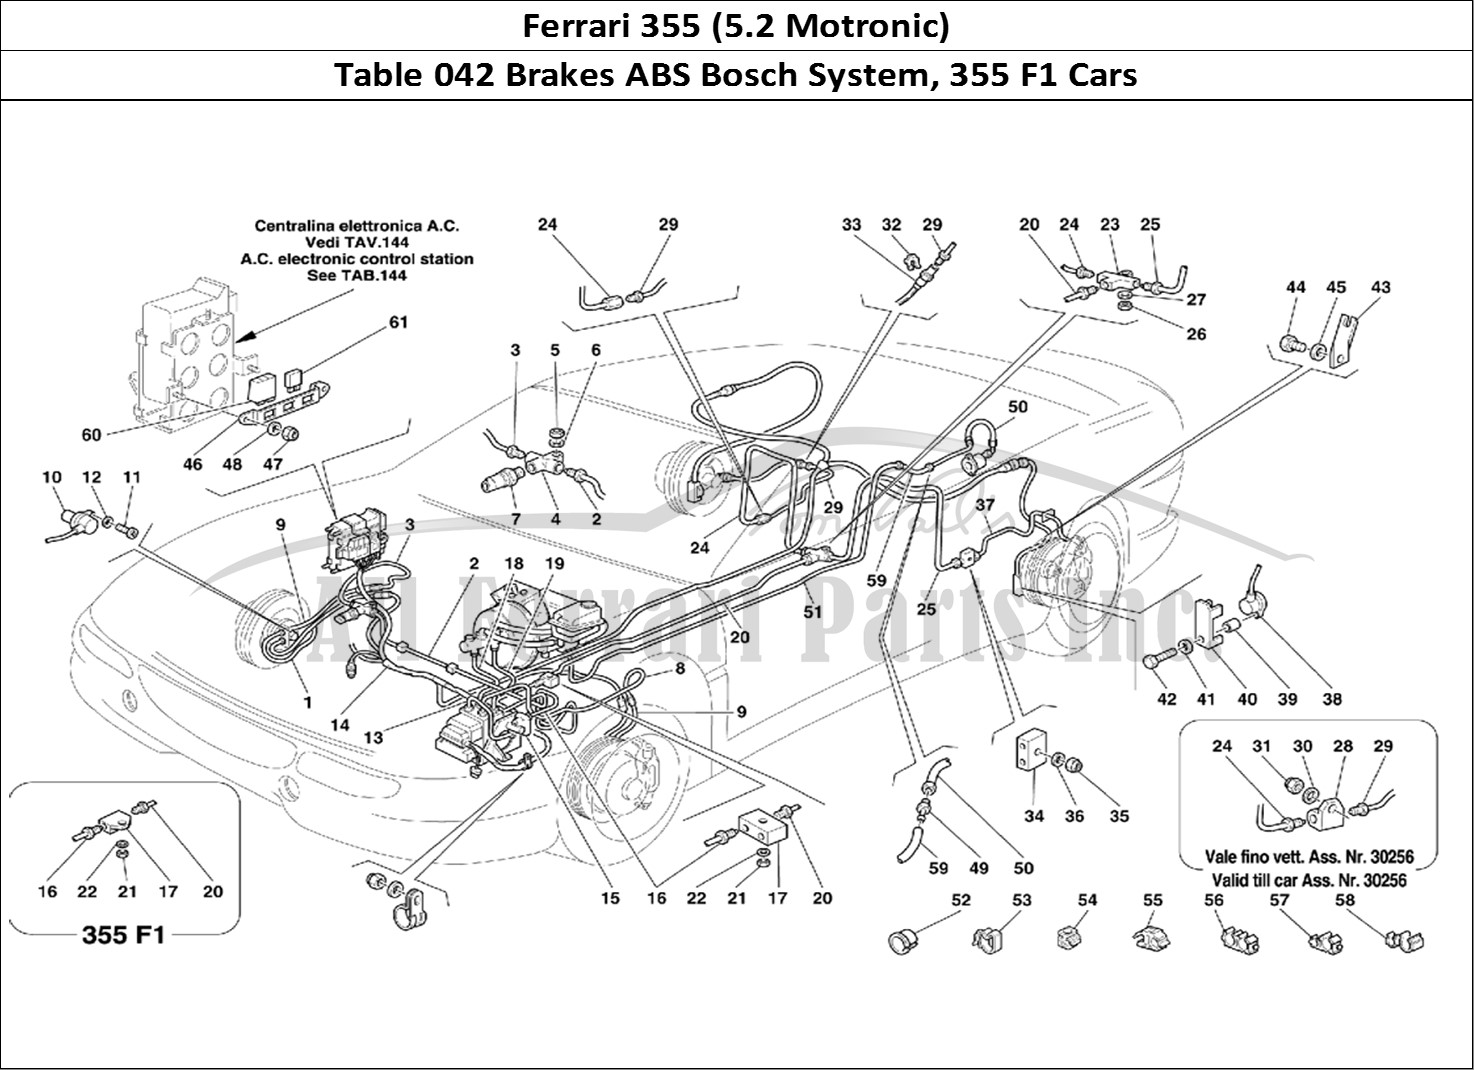 Buy original Ferrari 355 (5.2 Motronic) 042 Brakes ABS